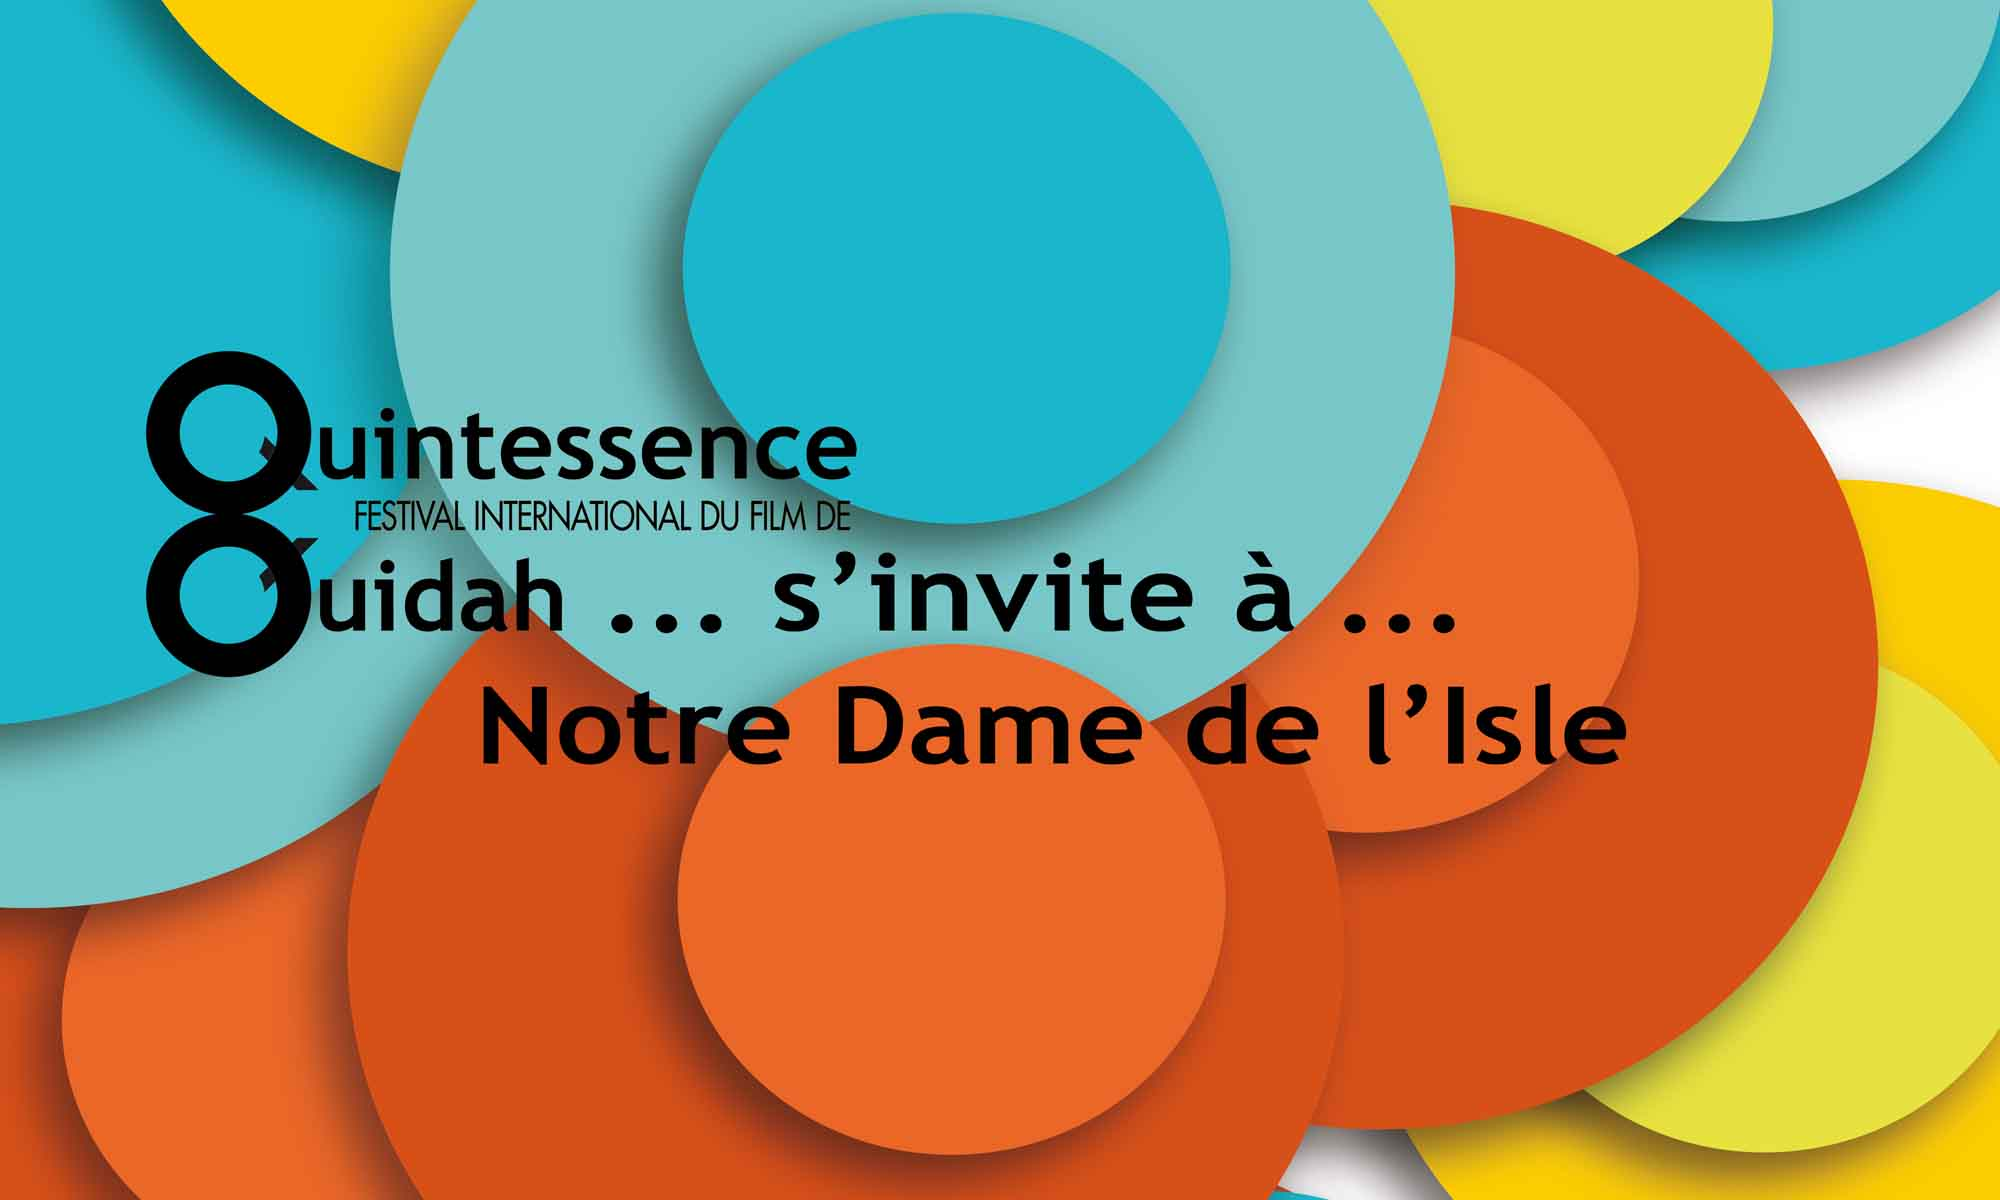 Quintessence s'invite à Notre Dame de l'Isle, en novembre 2016